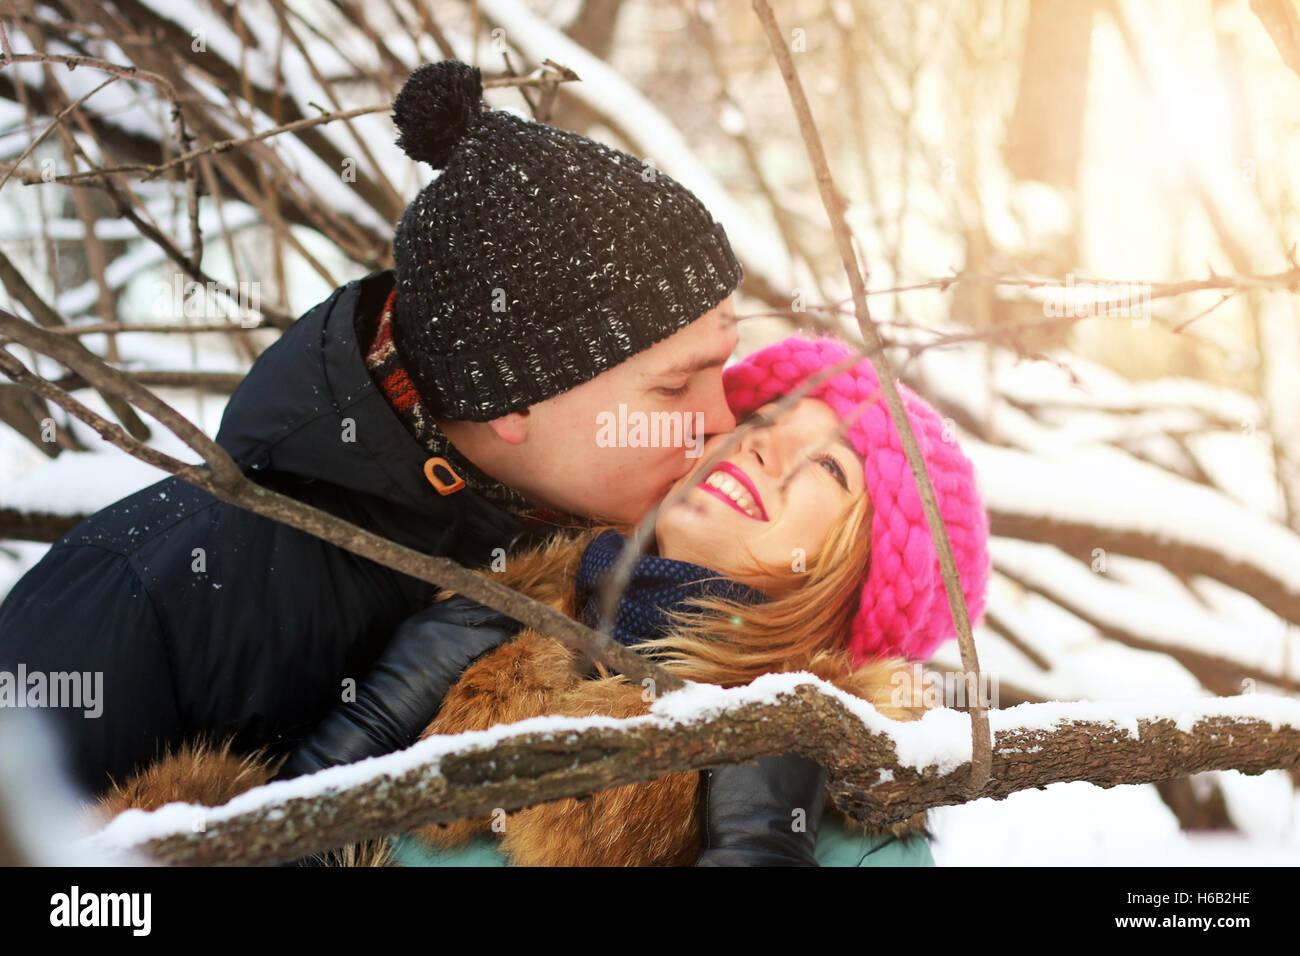 heterosexuals on a date in the winter - Stock Image